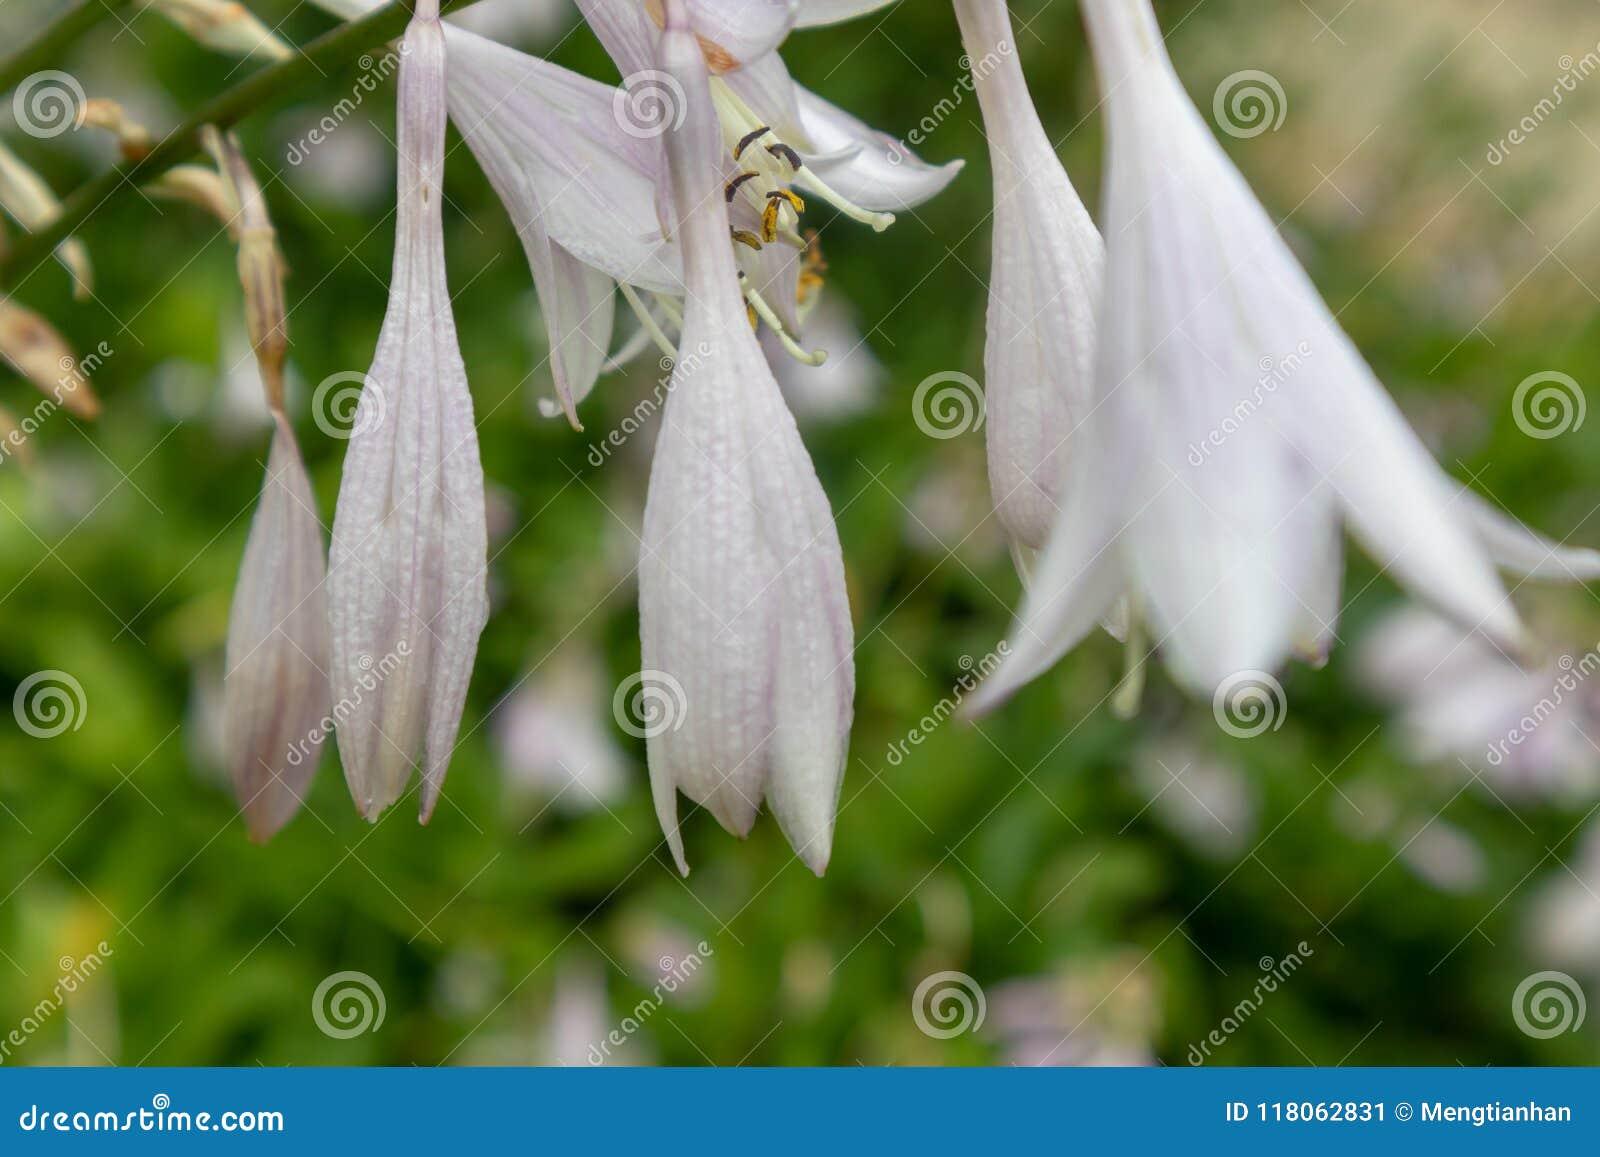 Flower of fragrant plantain lily hosta plantaginea lam aschers download flower of fragrant plantain lily hosta plantaginea lam aschers stock image image izmirmasajfo